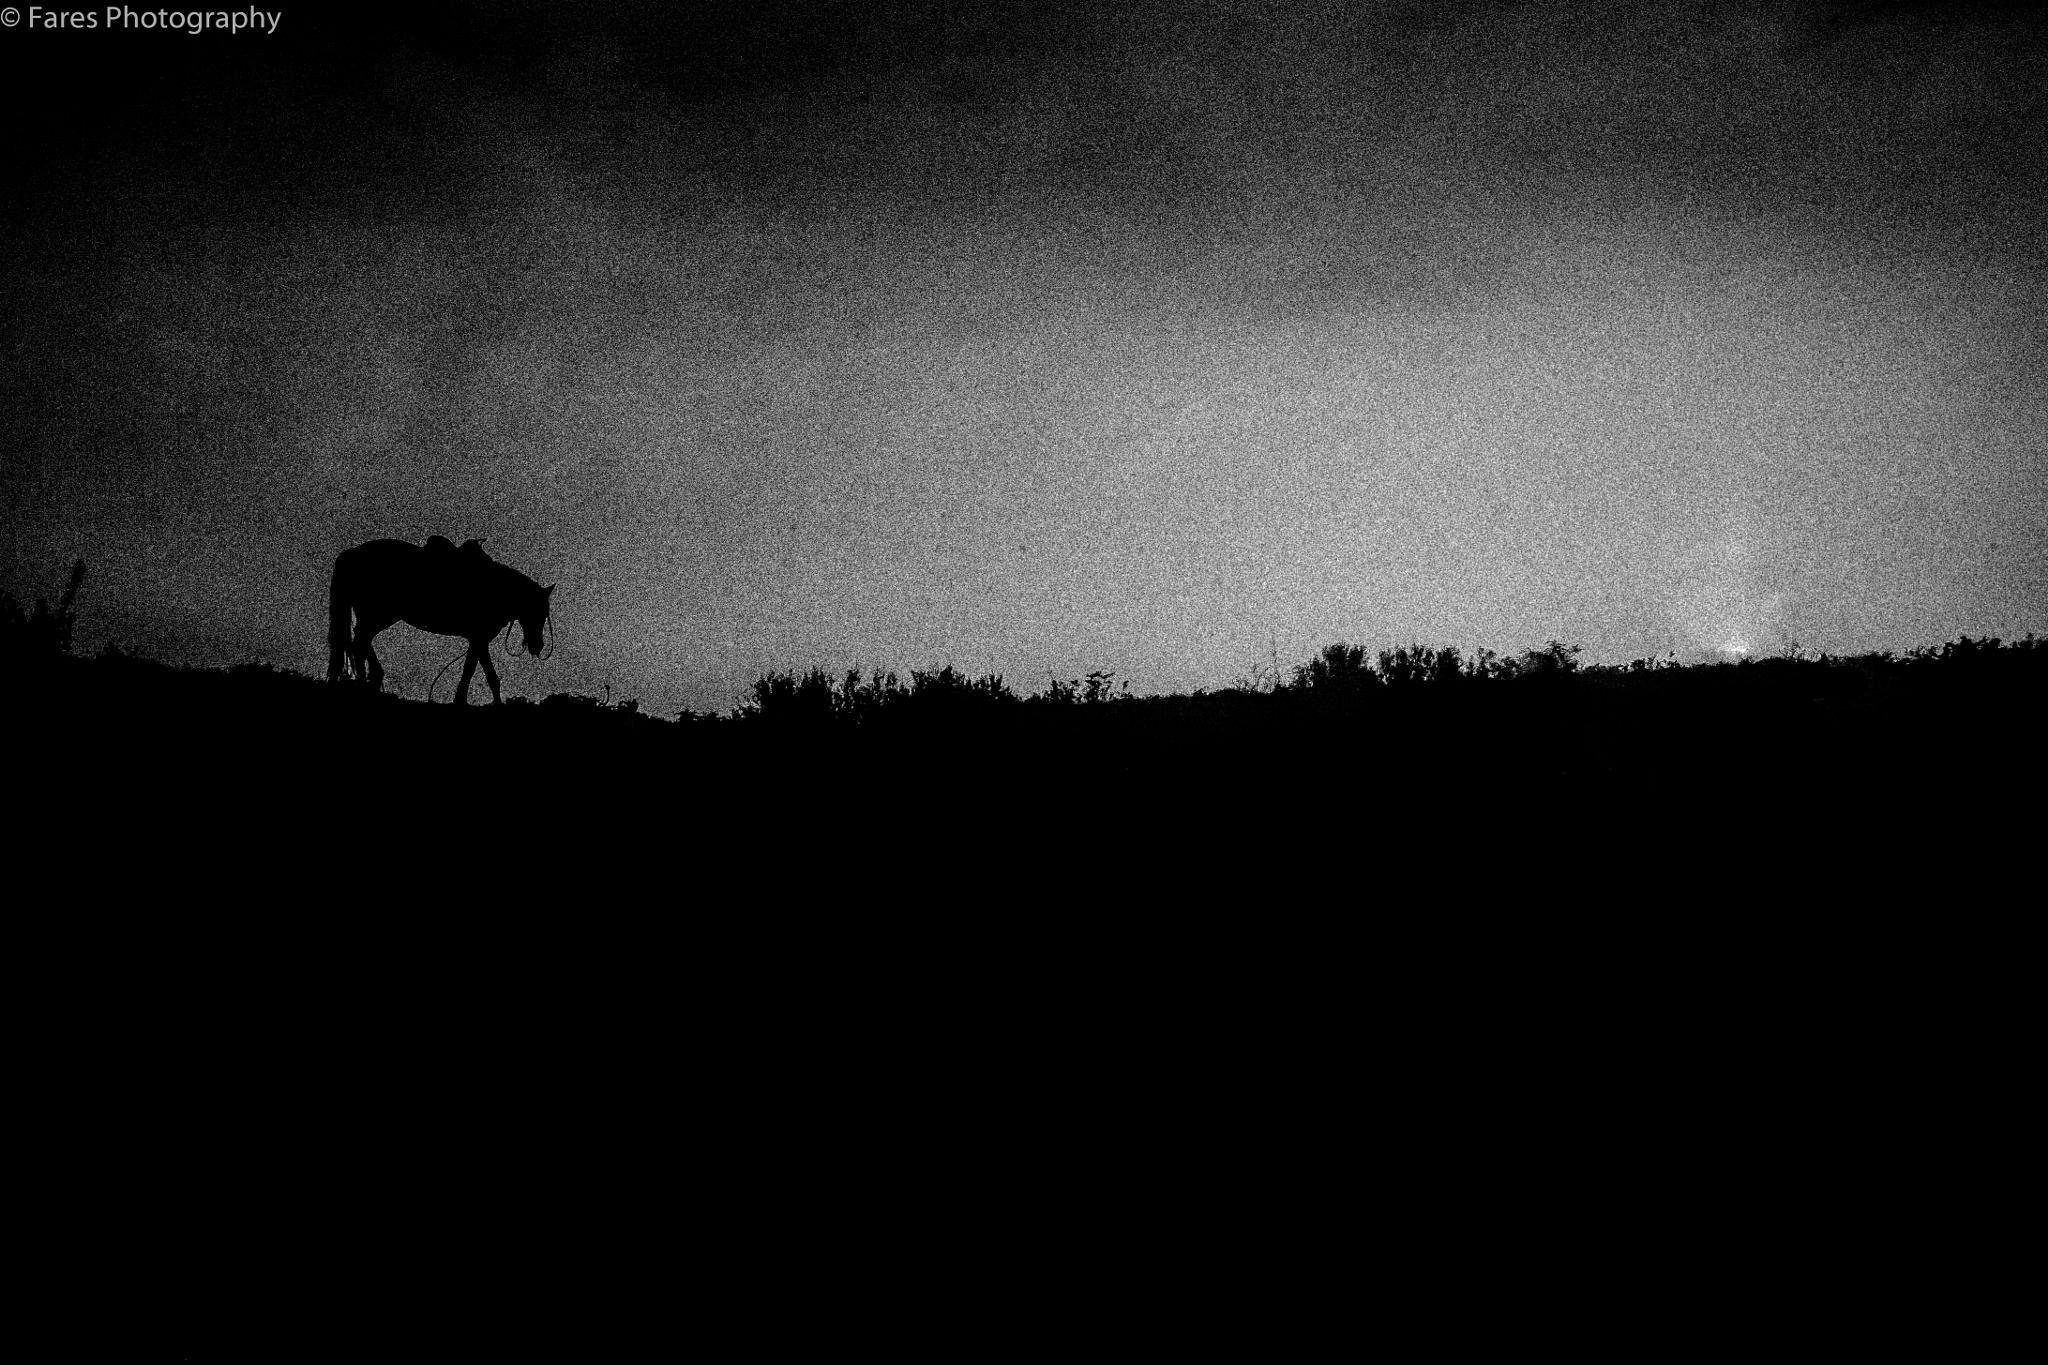 horse  by Fares Annaba